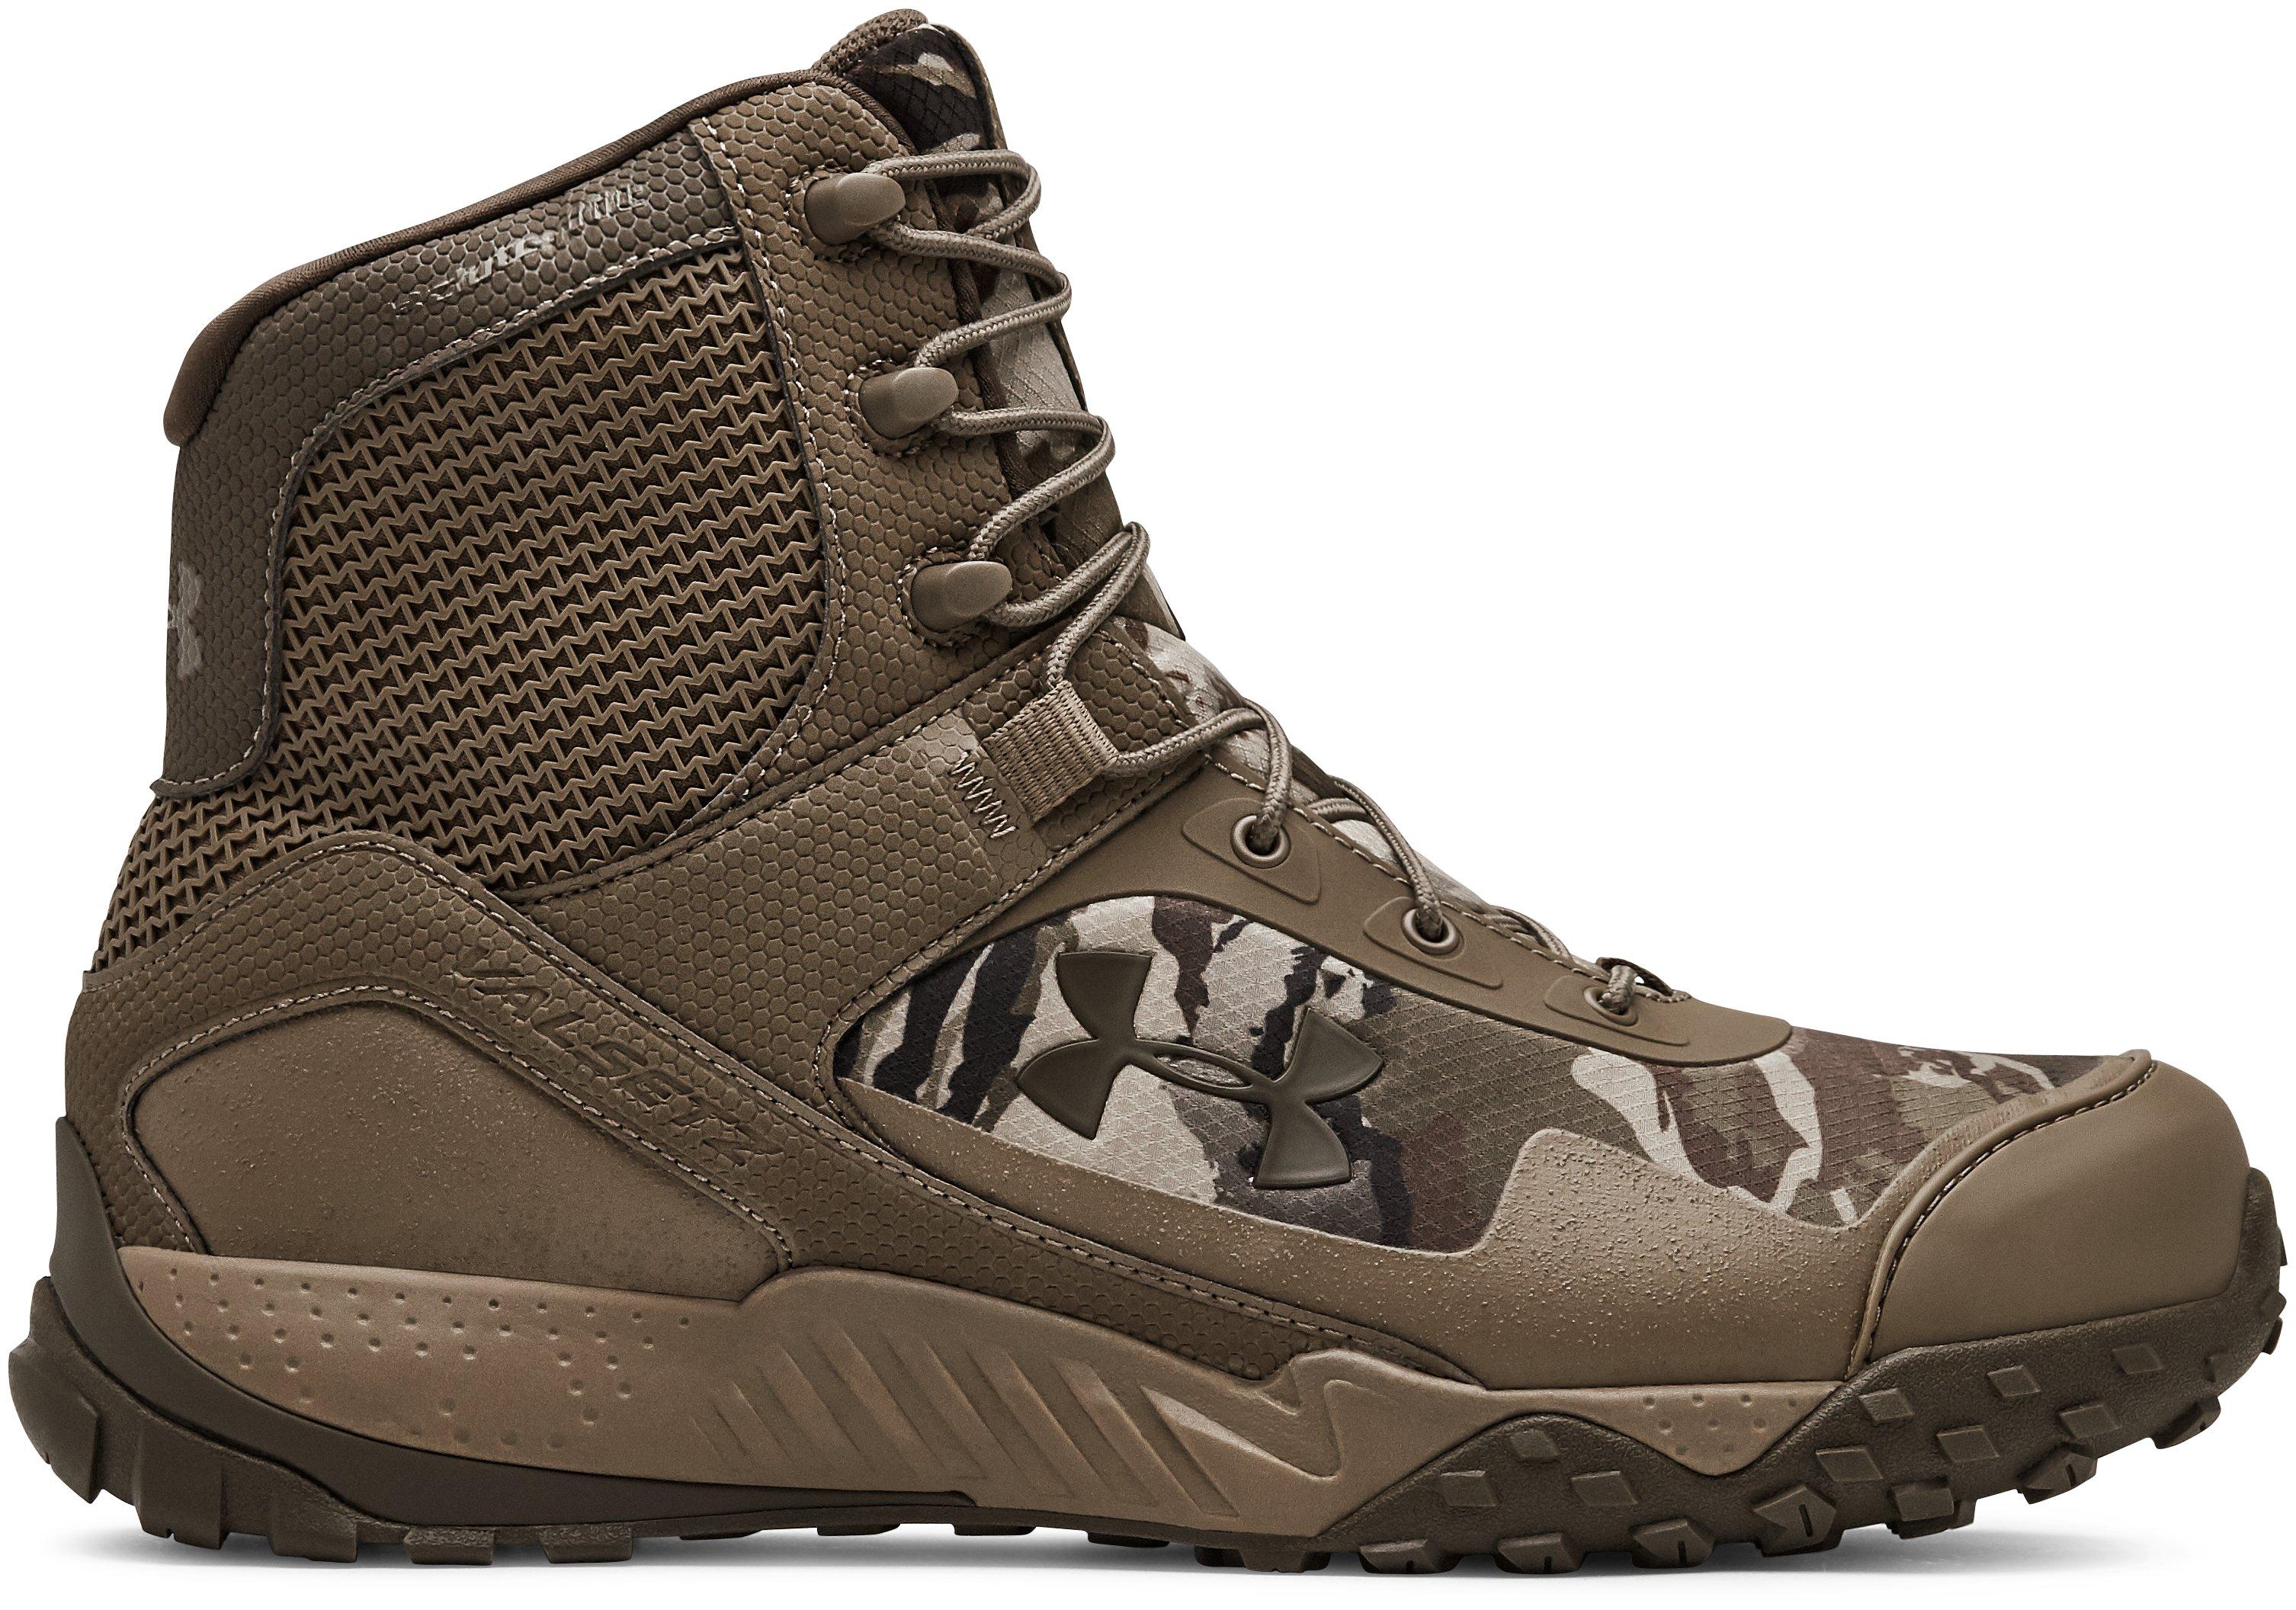 Sepatu Boot Tactical UA Valsetz RTS 1.5 untuk Pria, 360 degree view